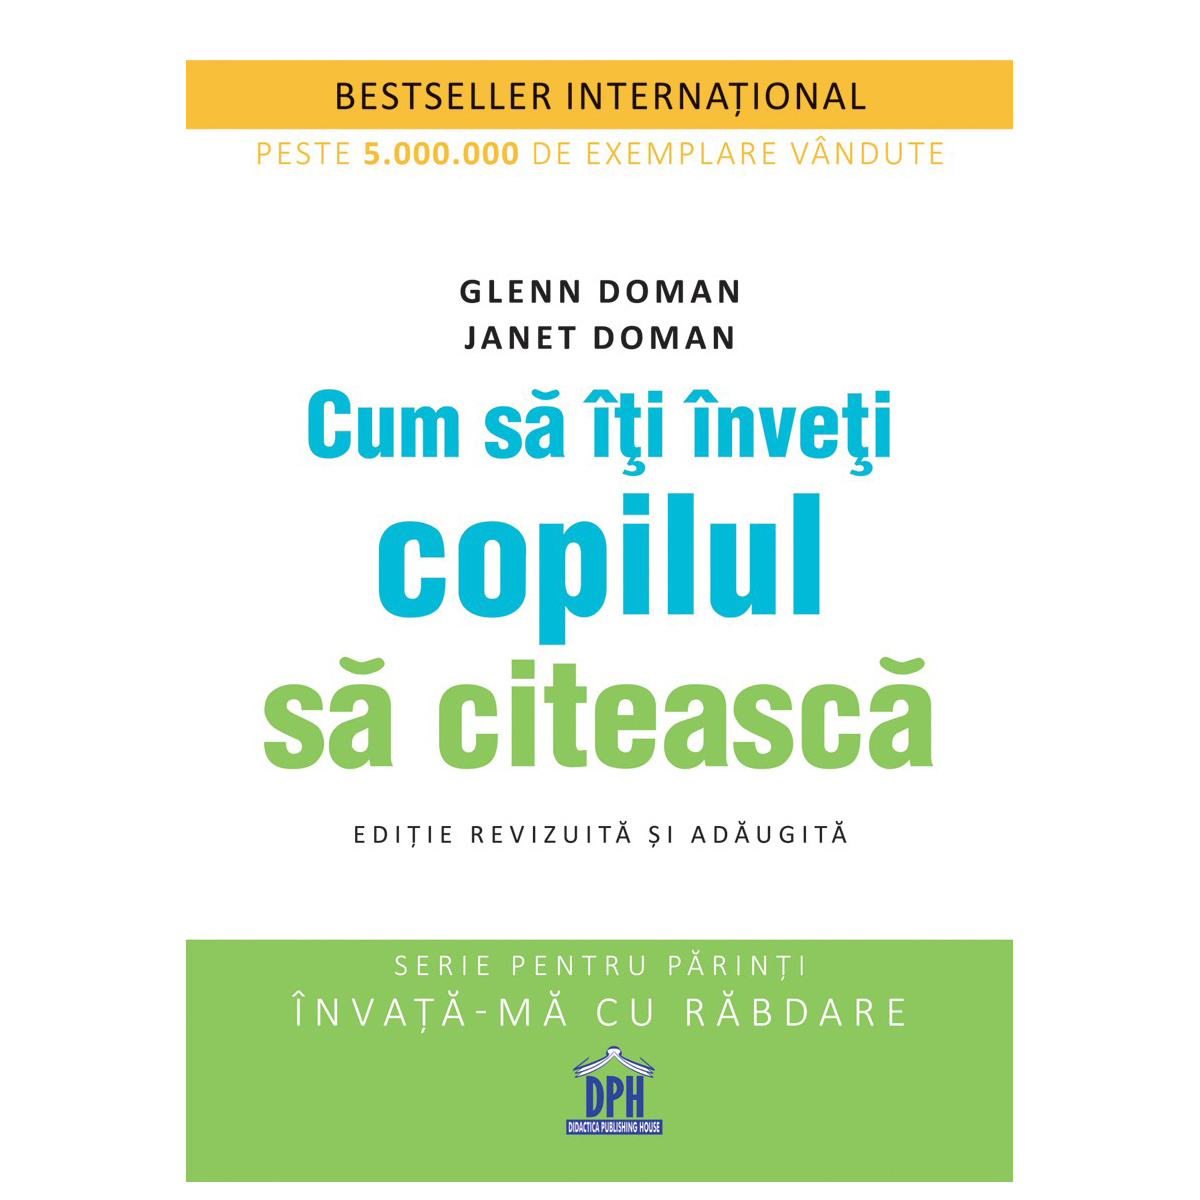 Carte Cum sa iti inveti copilul sa citeasca, Editura DPH